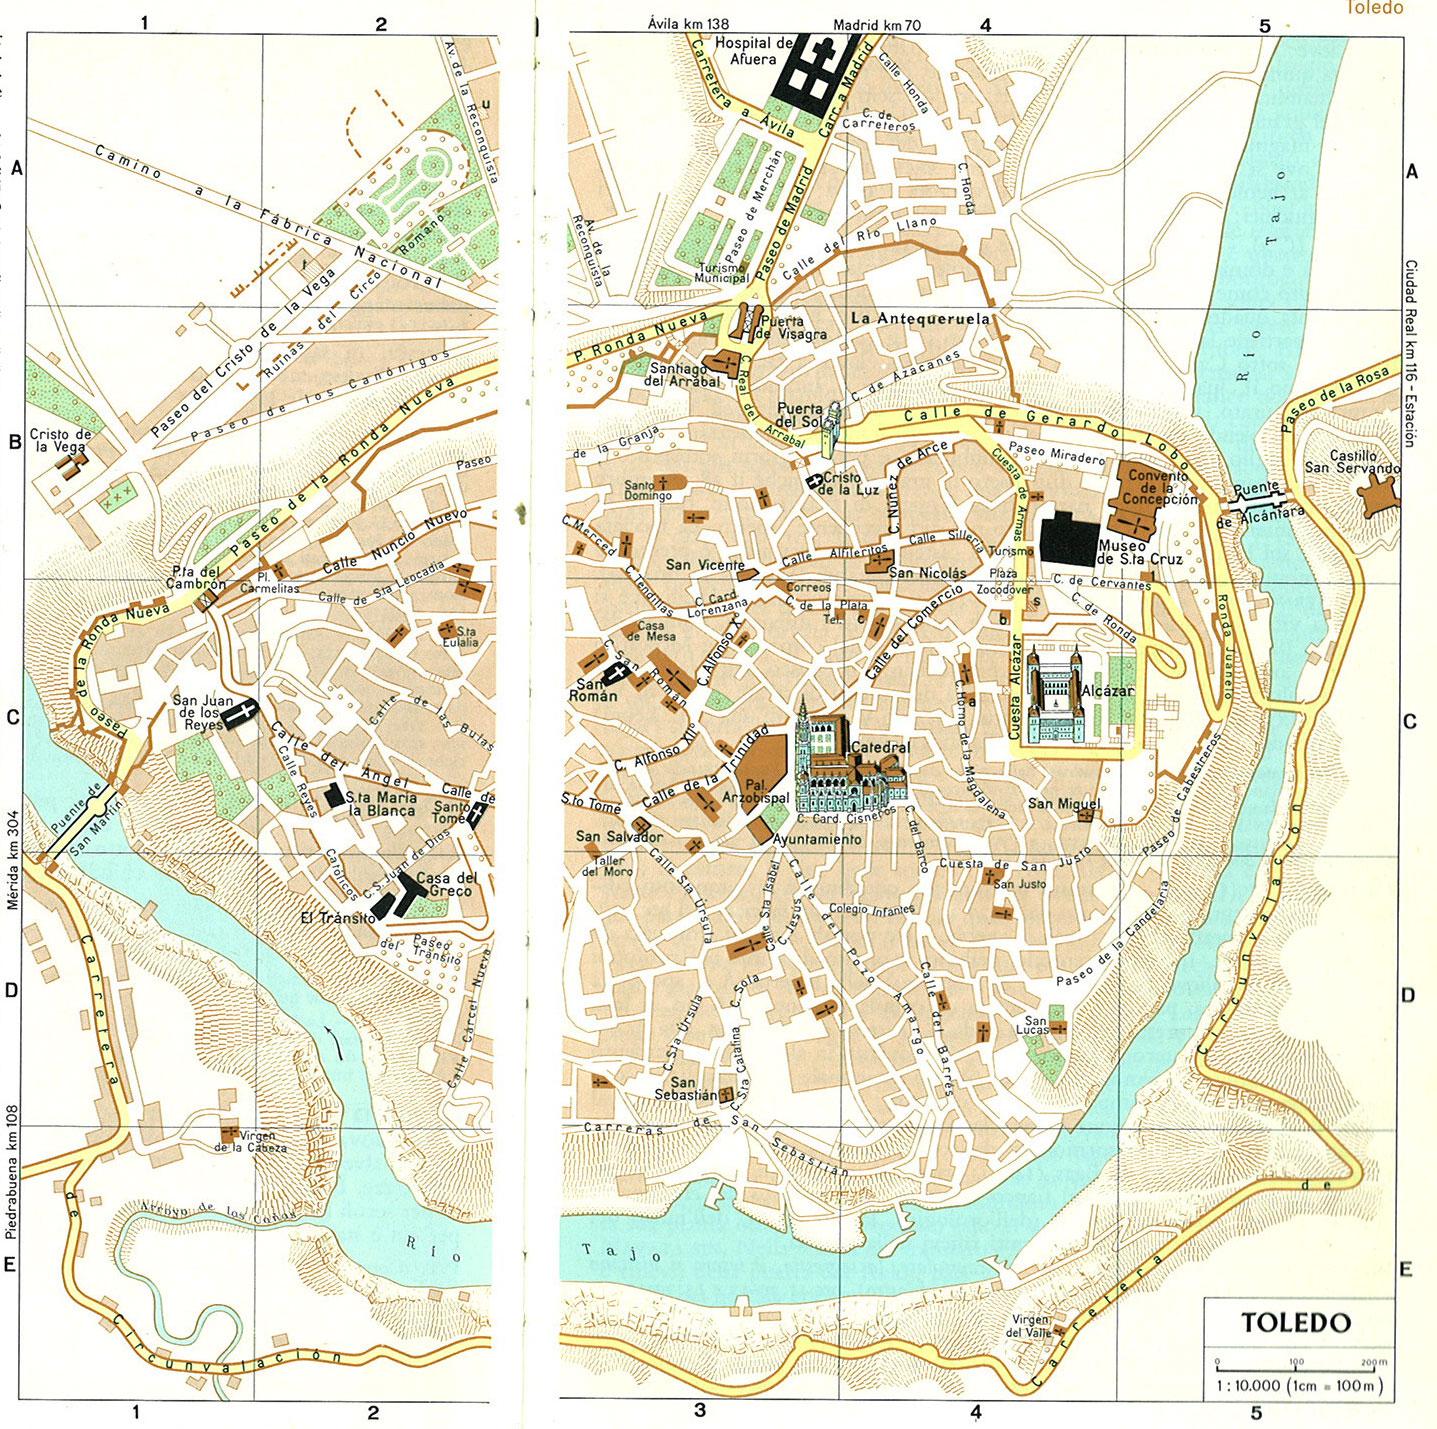 toledo_mappa.jpg